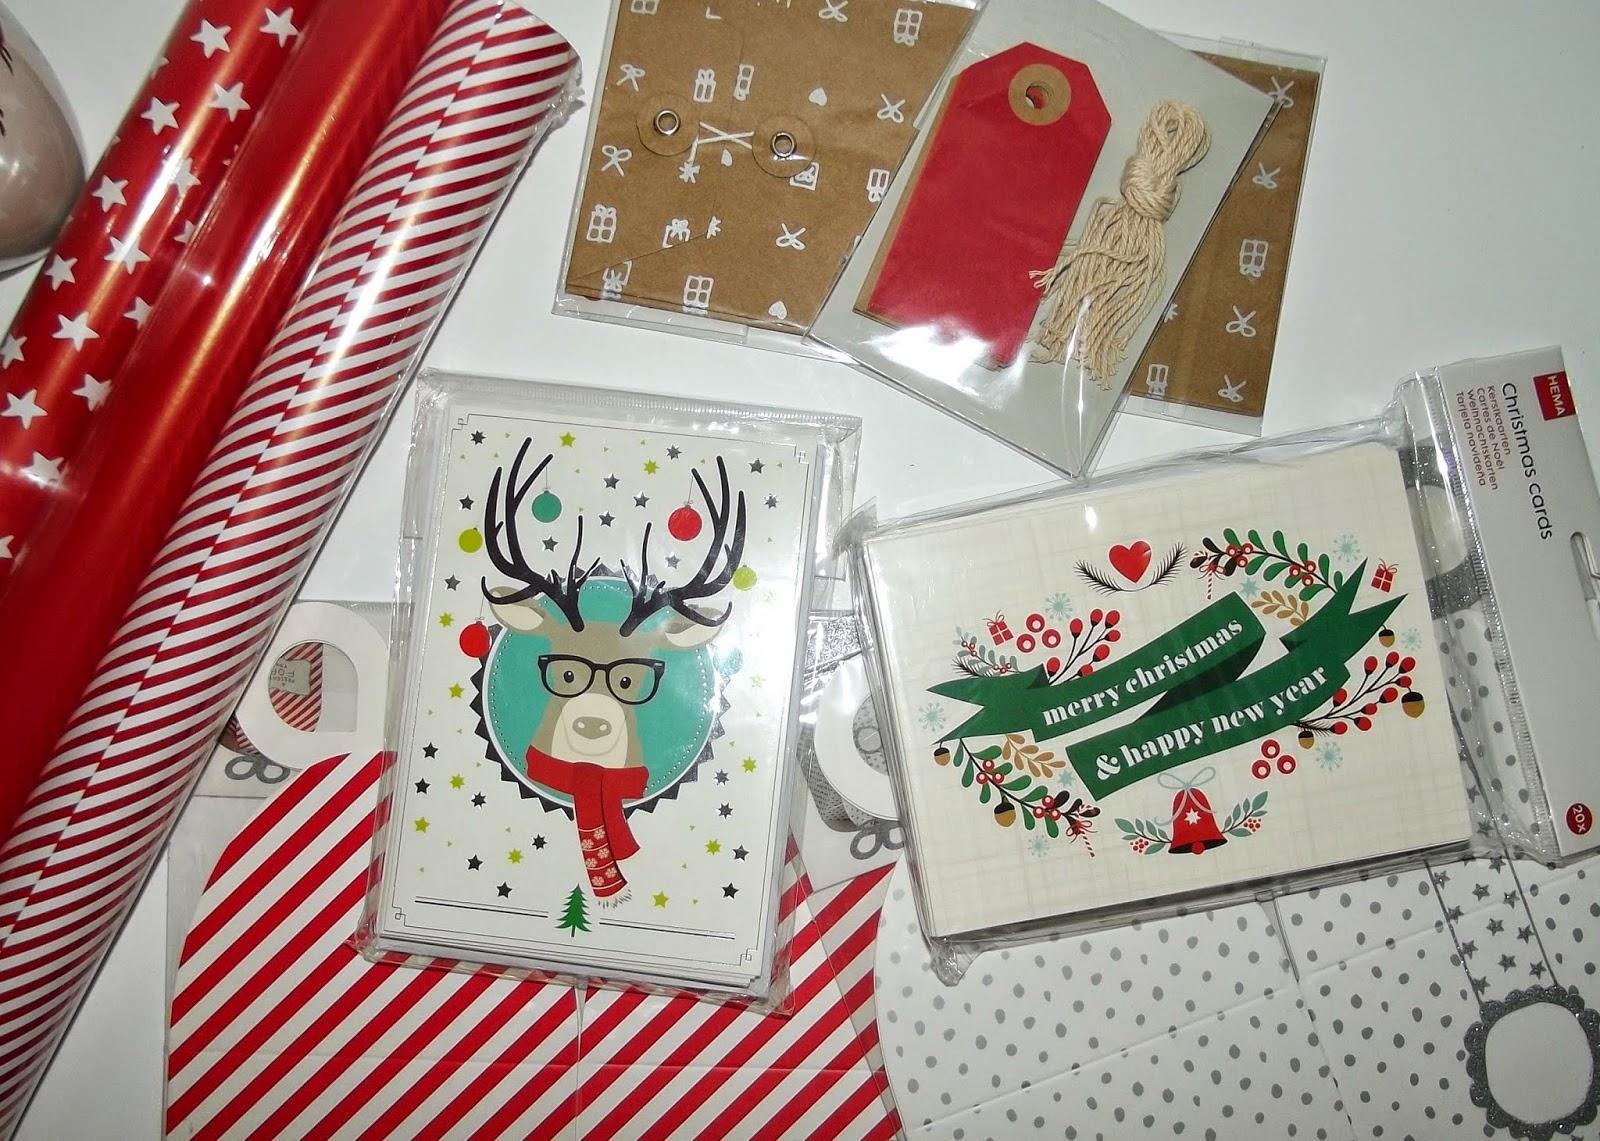 Haul Hema: Get ready for Christmas